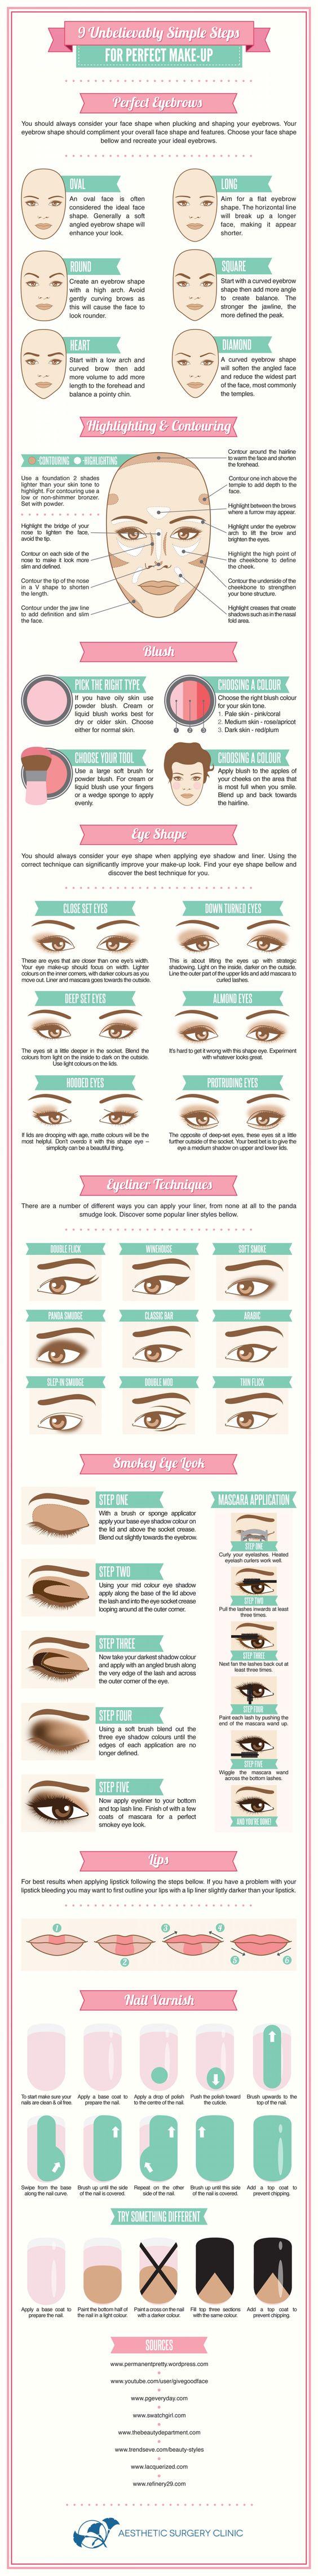 9 Unbelievably Simple Steps For Perfect Make-Up | #DIY #tips  http://www.pinterest.com/adisavoiaditrev/